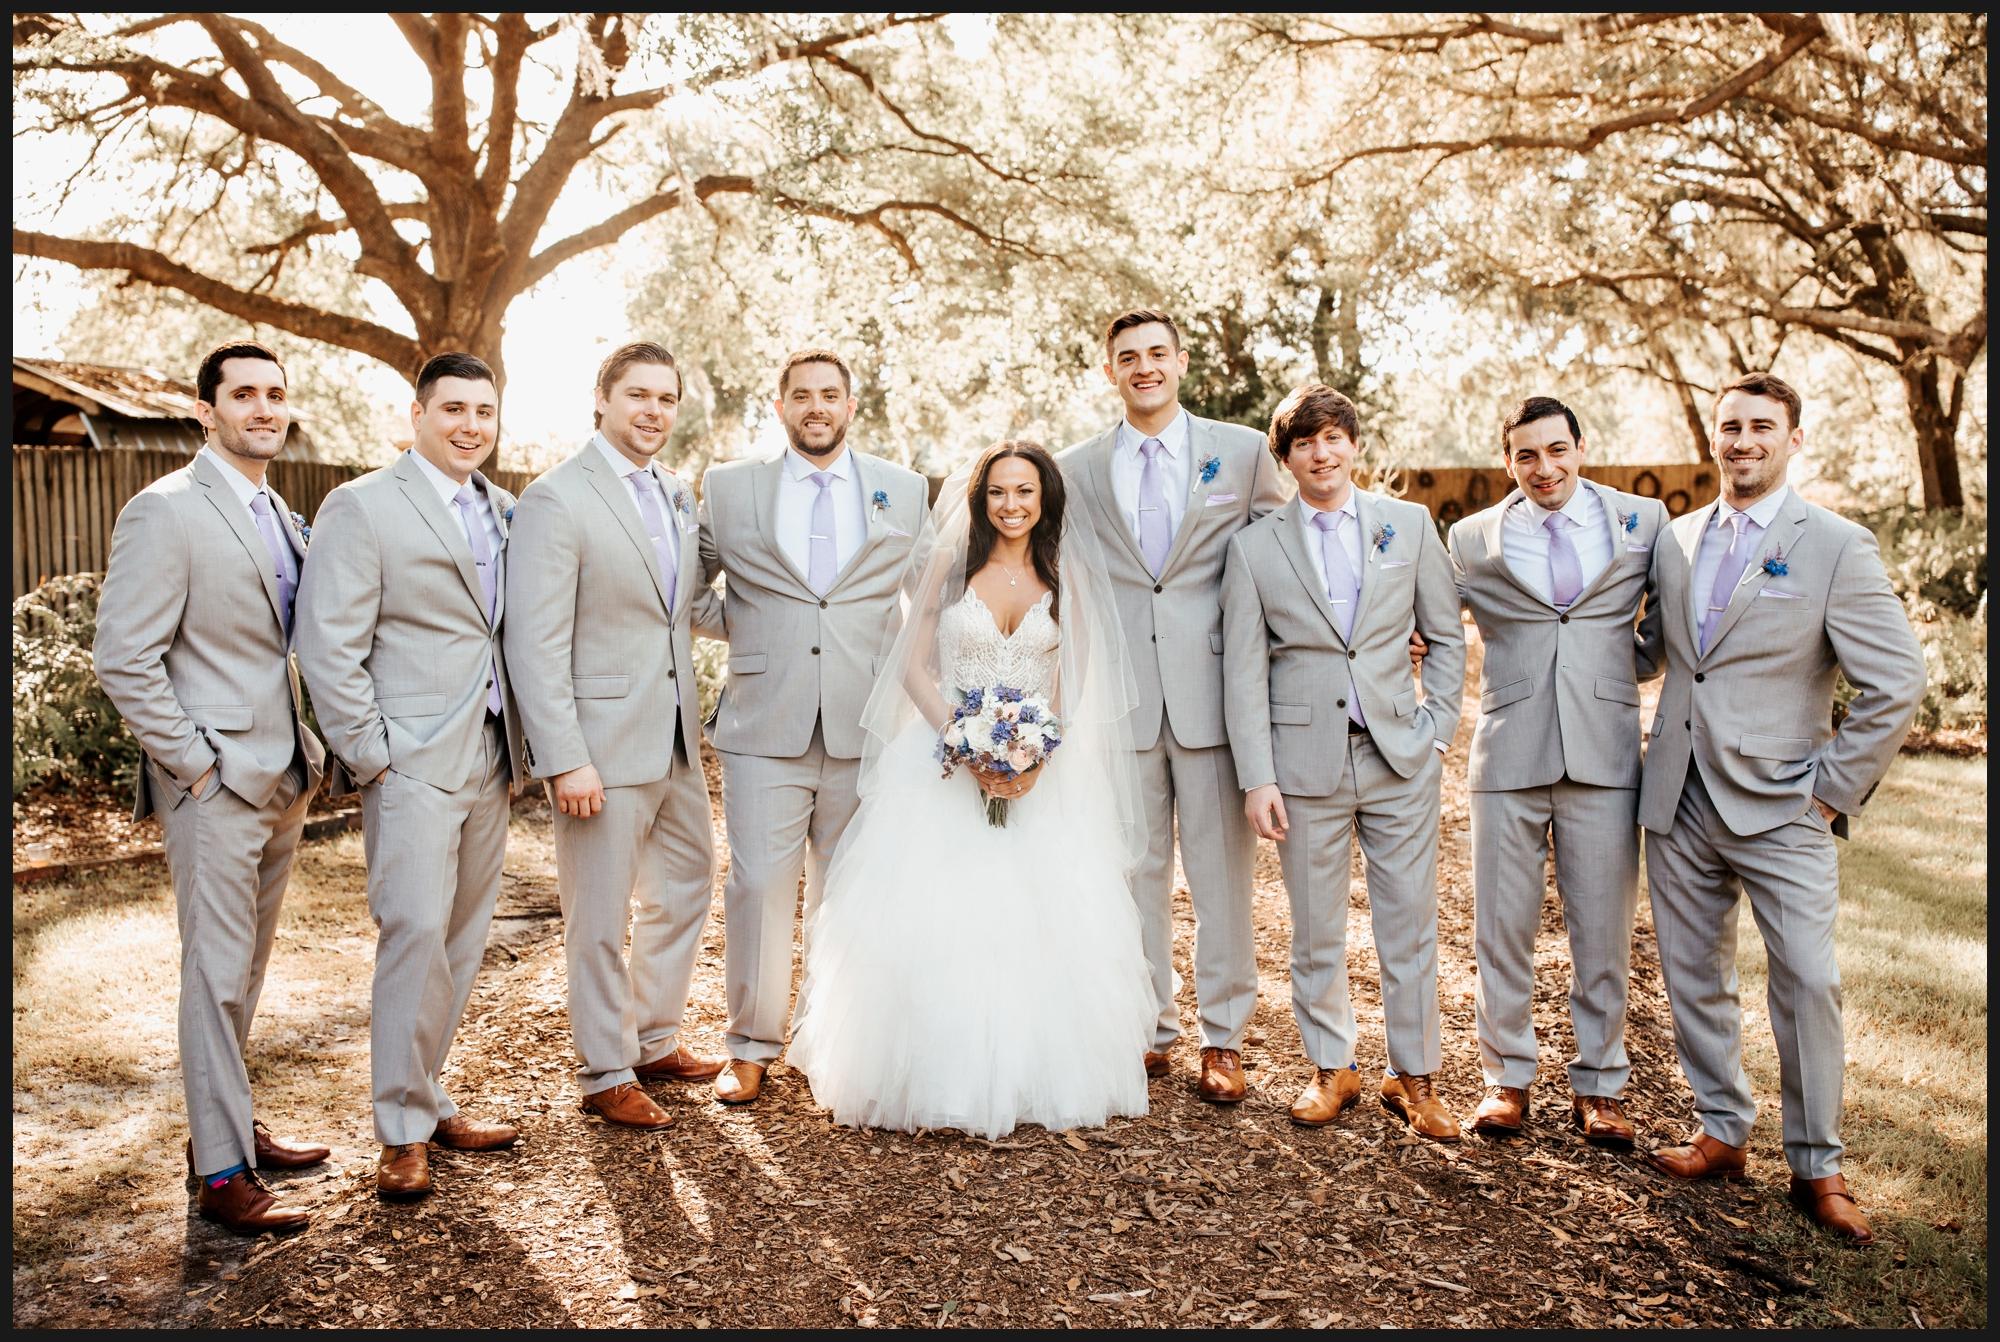 Orlando-Wedding-Photographer-destination-wedding-photographer-florida-wedding-photographer-bohemian-wedding-photographer_1623.jpg